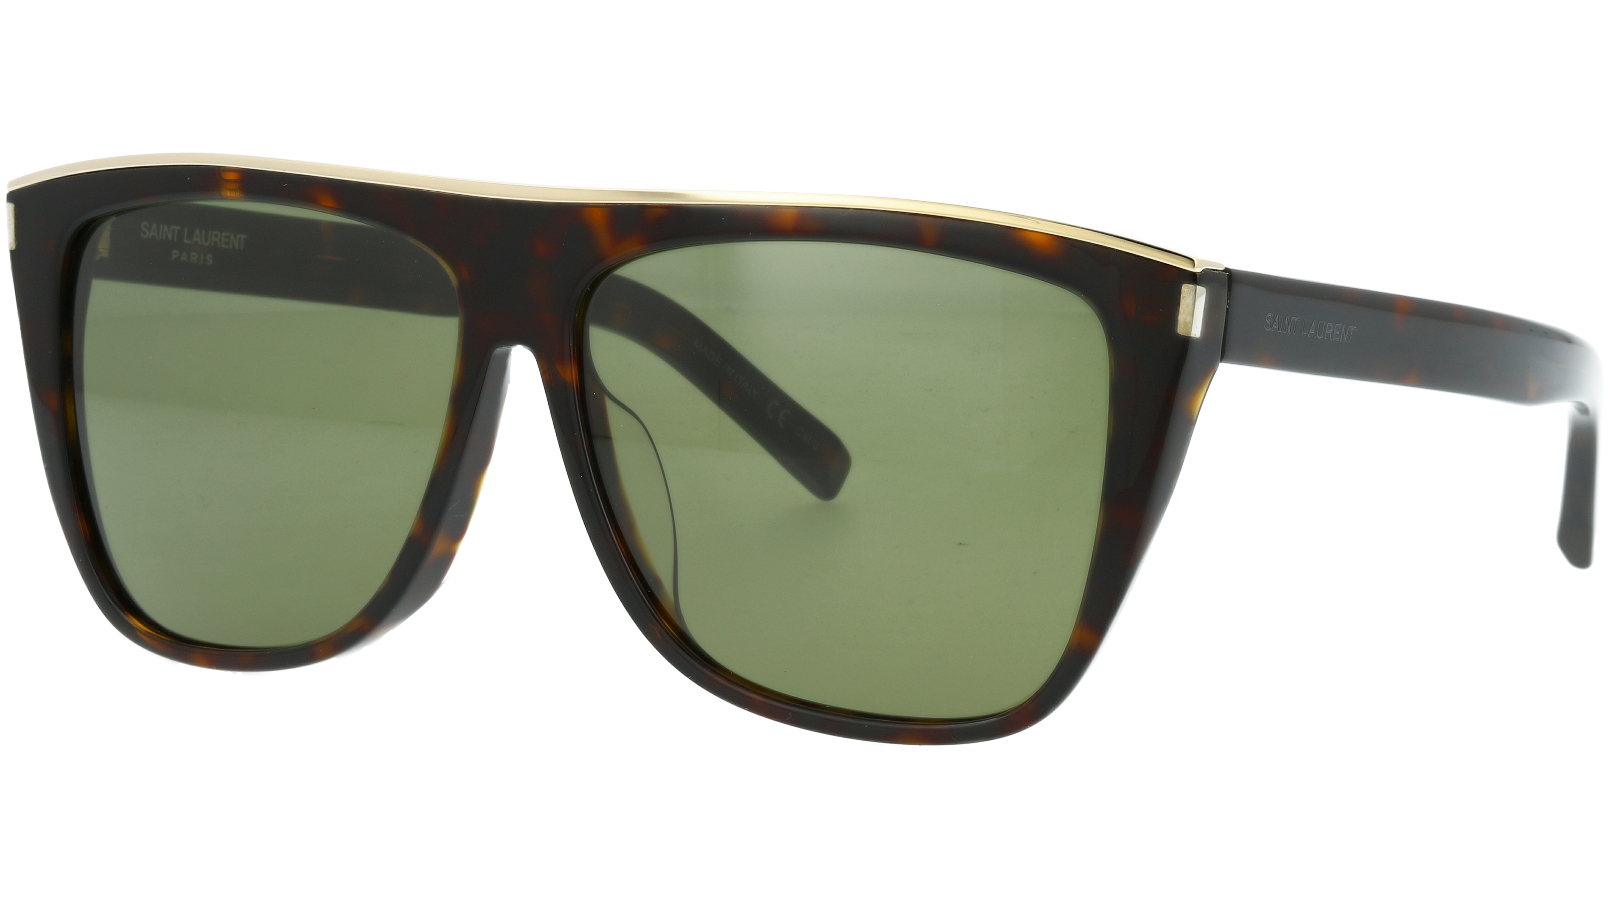 Saint Laurent SL1/F COMBI 004 59 Avana Sunglasses